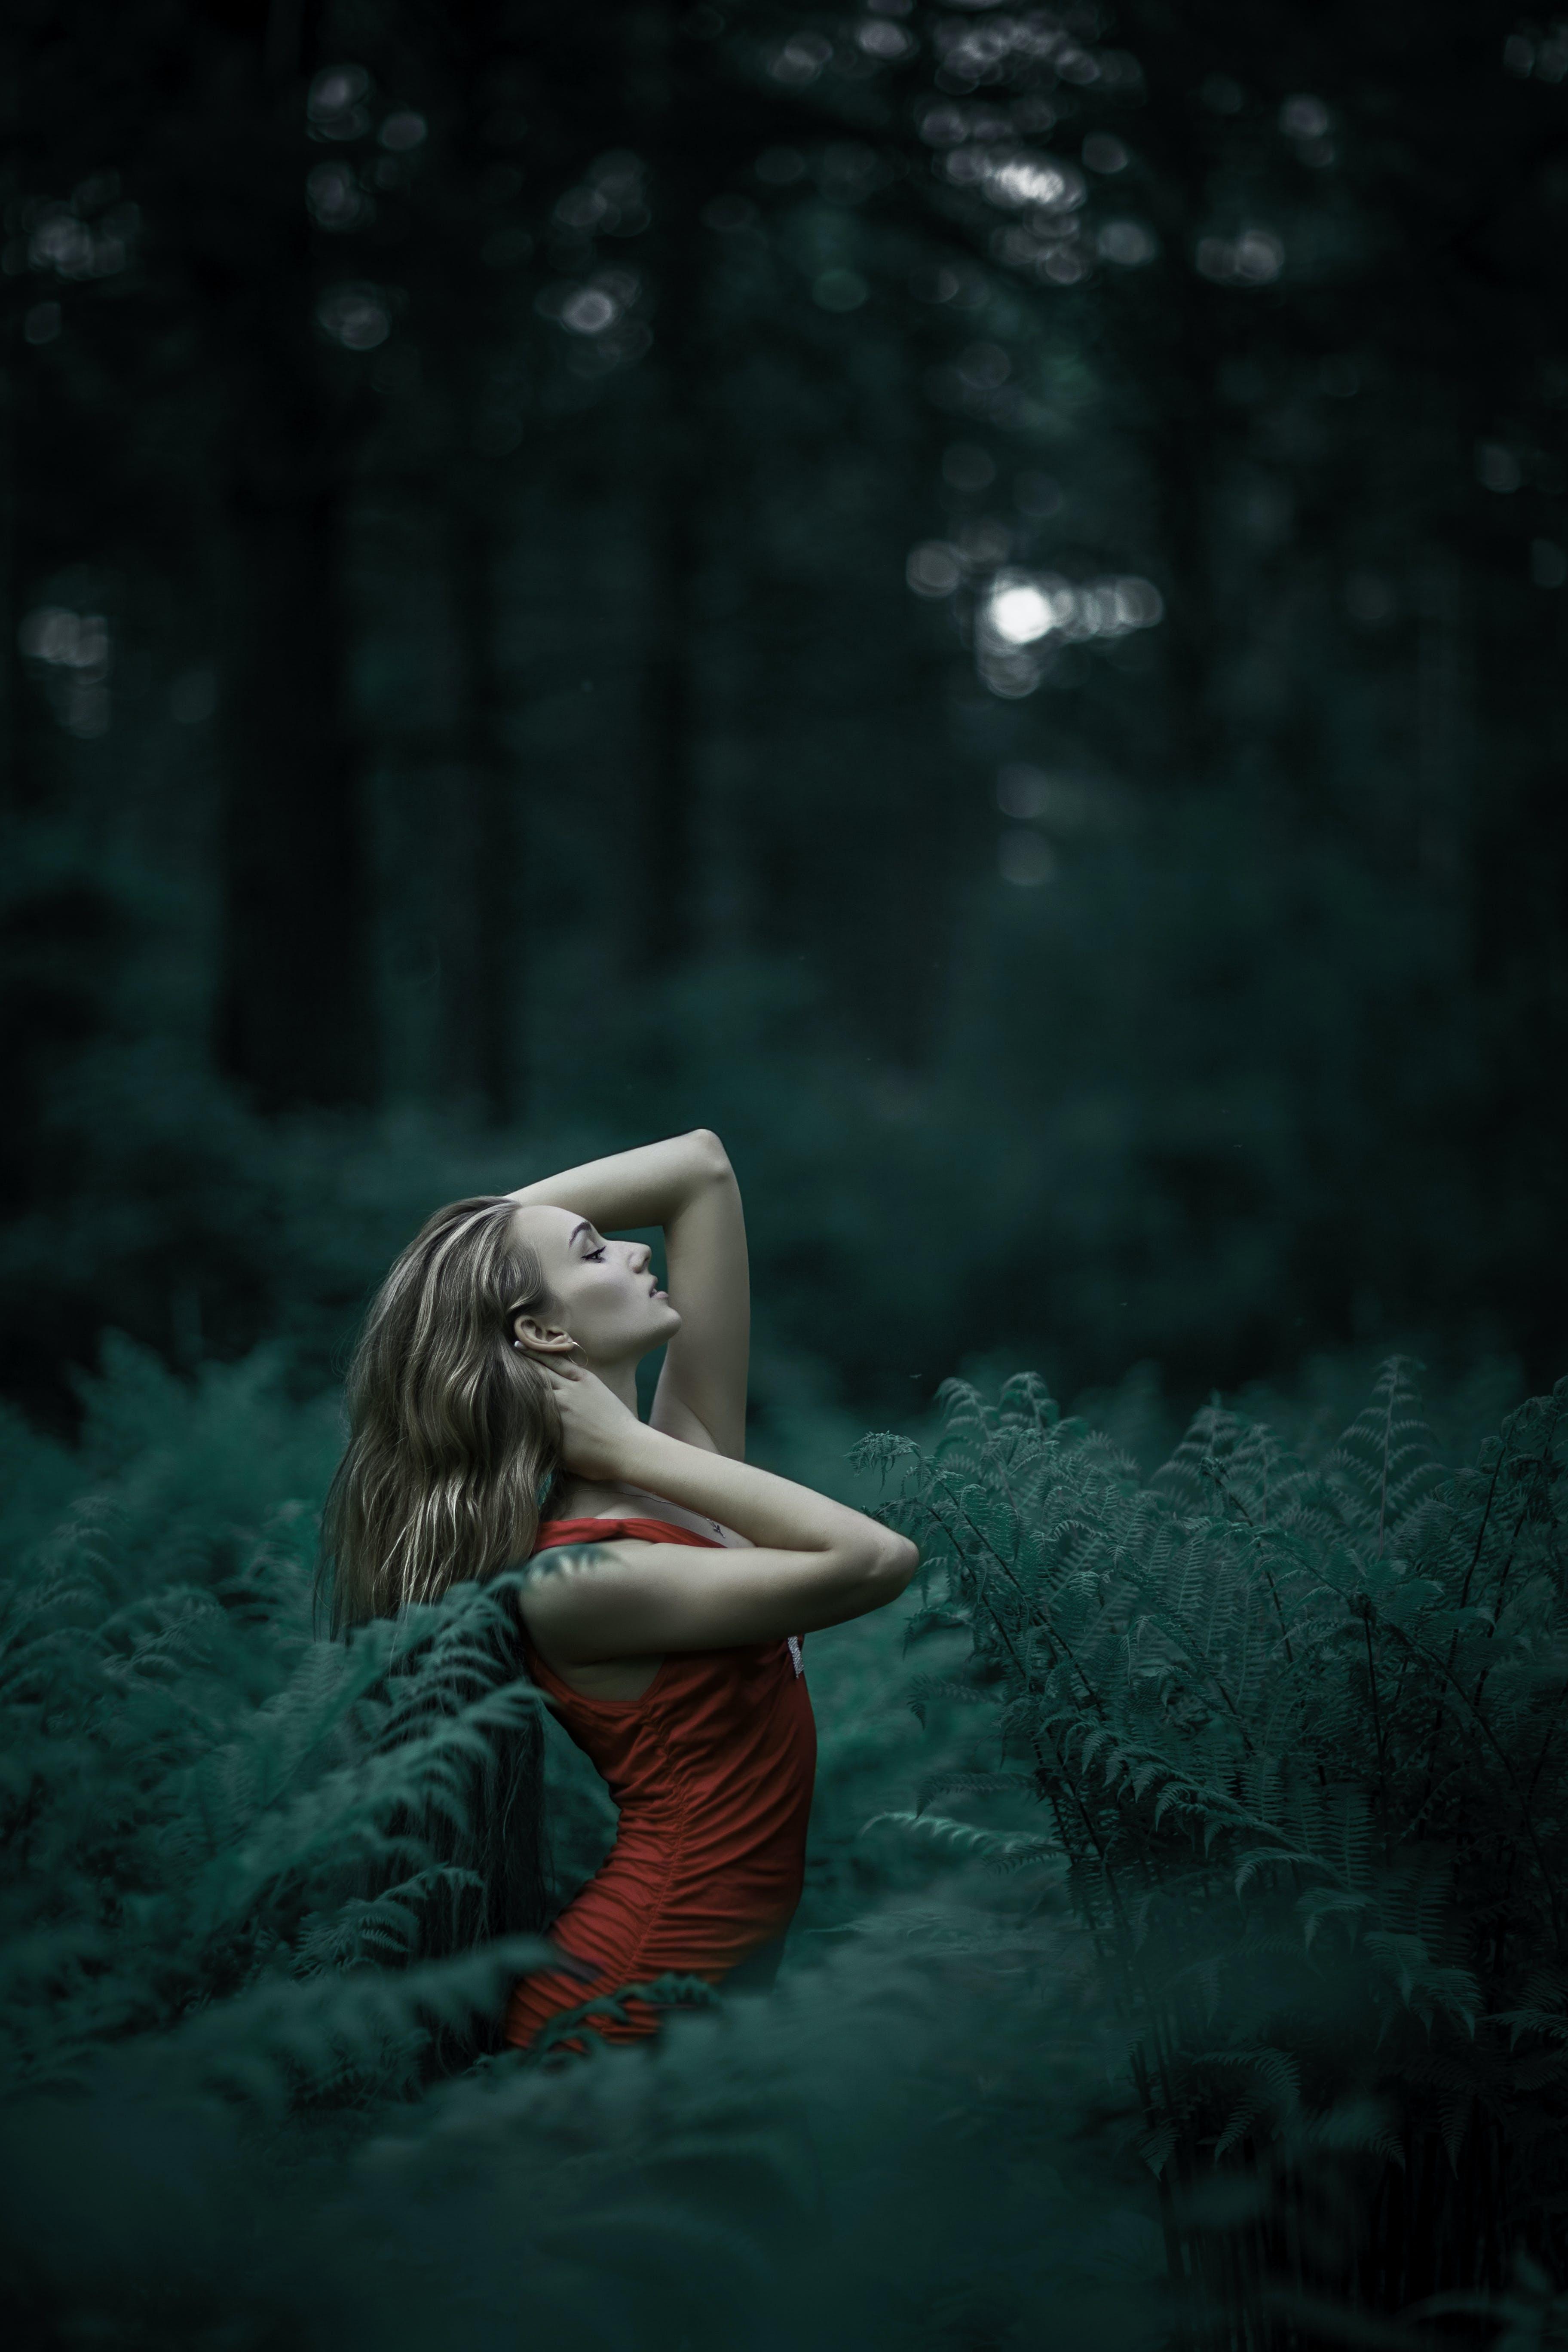 Woman Wearing Red Sleeveless Dress Standing Near Fern Leaves